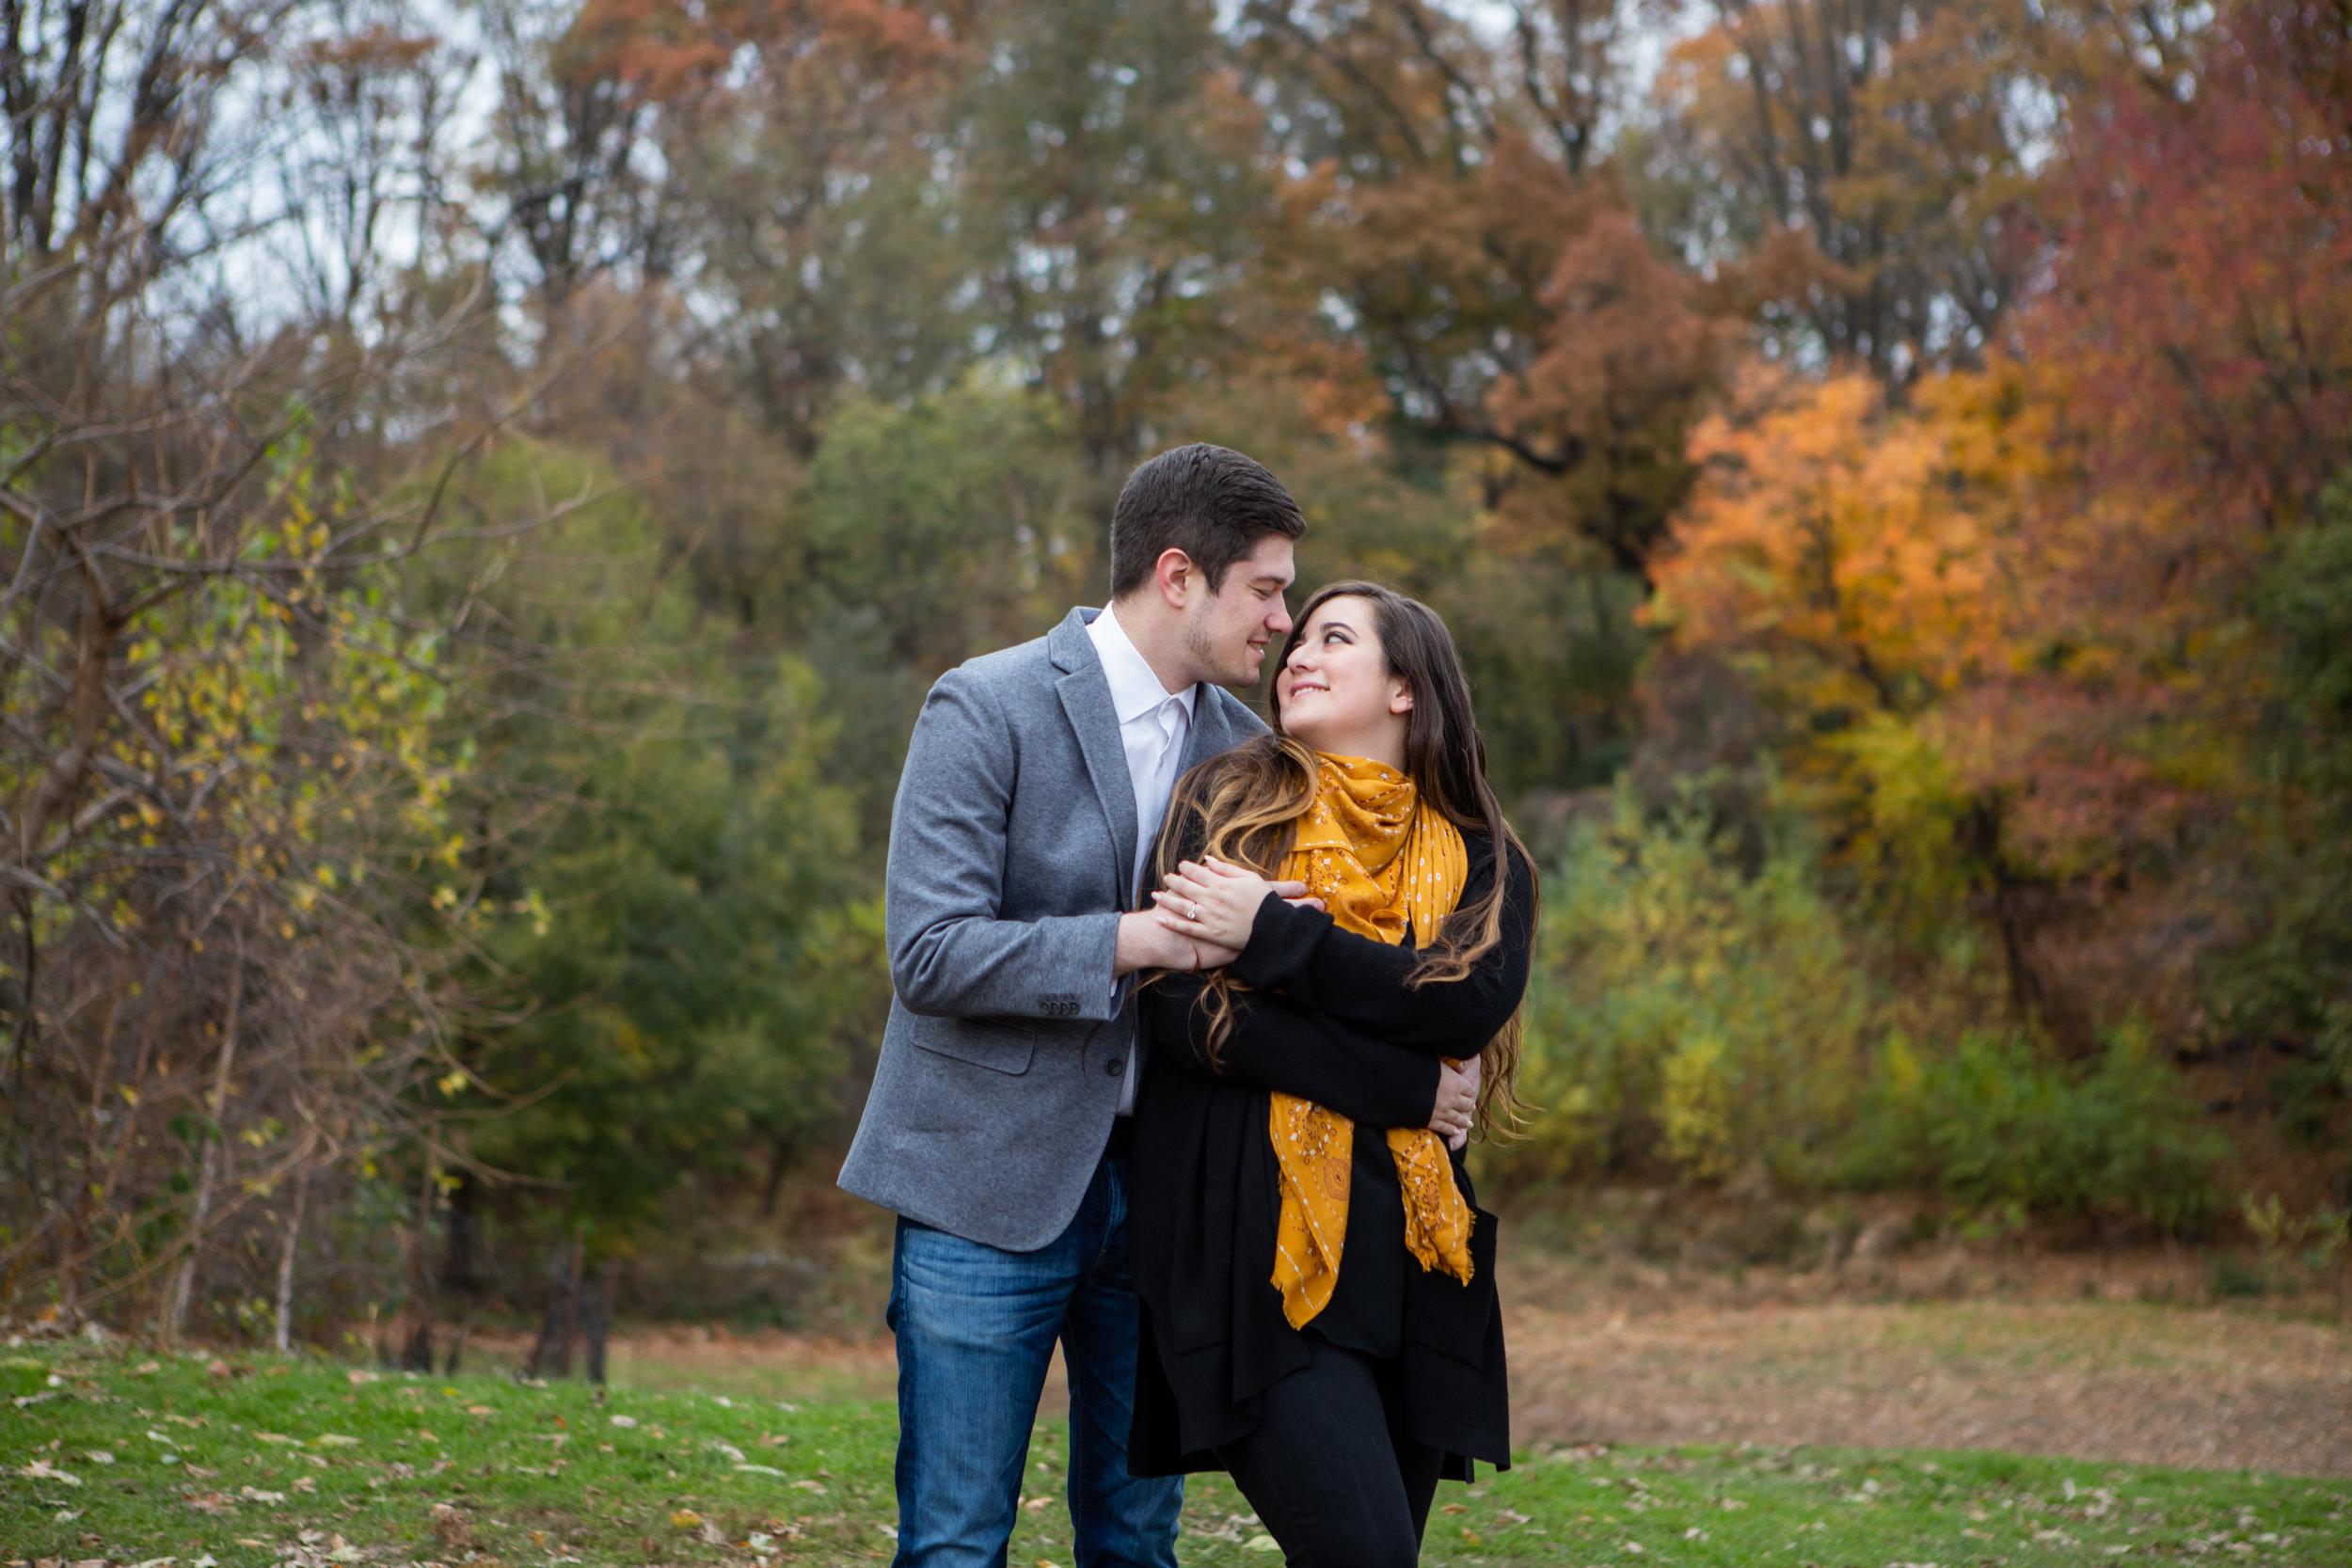 Kate-Alison-Photography-Prospect-Park-Brooklyn-Engagement-Session-Jenna-James-48.jpg